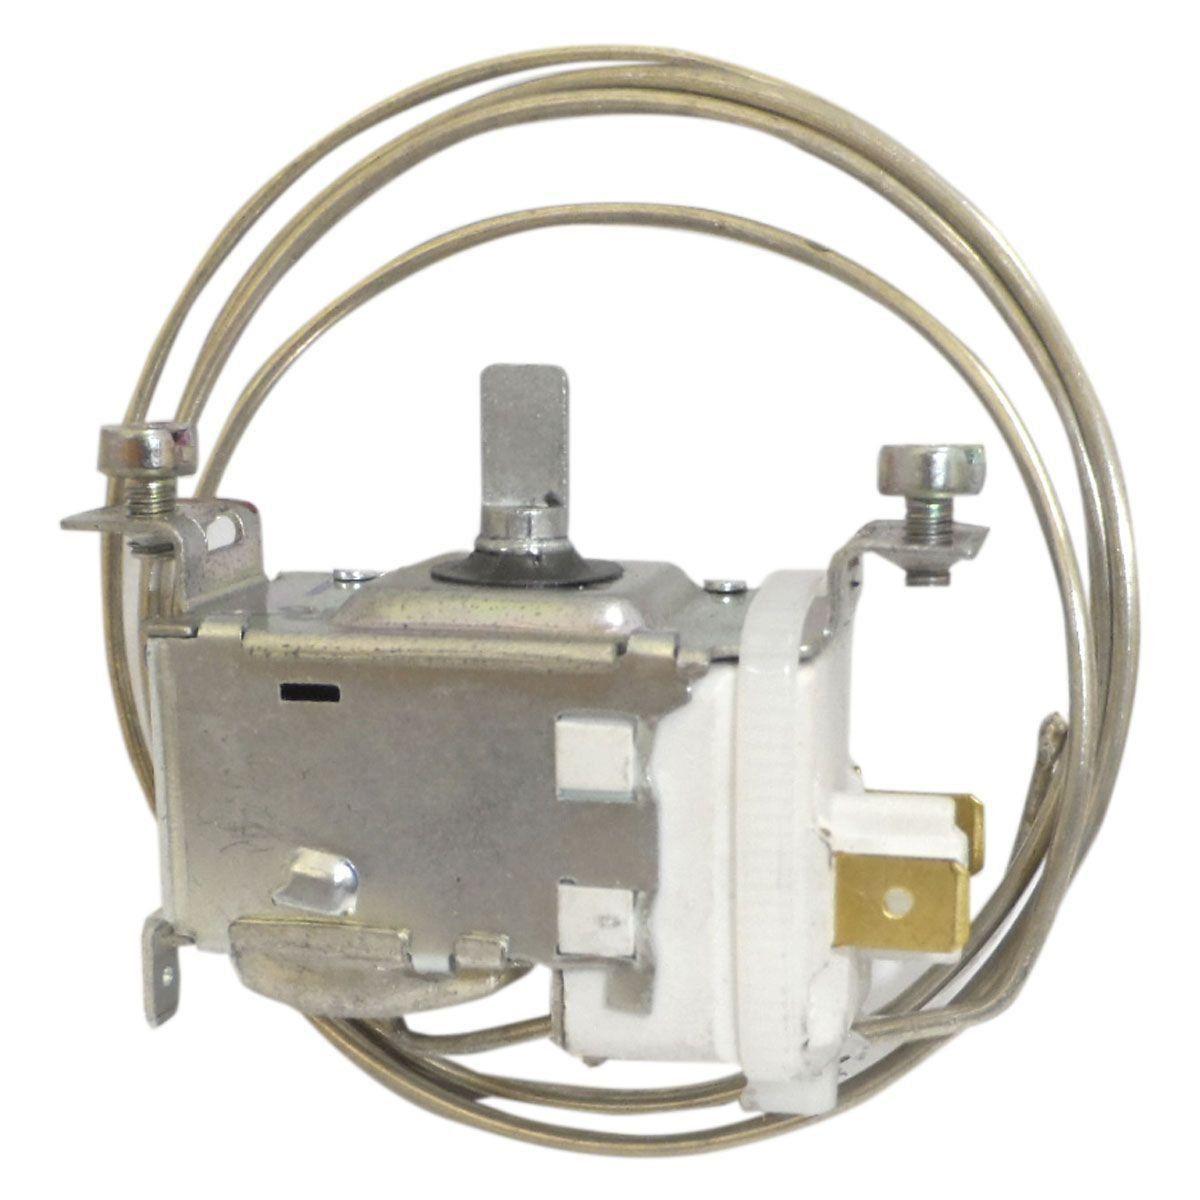 Termostato Balcão Frigorífico Universal RC13600-3P